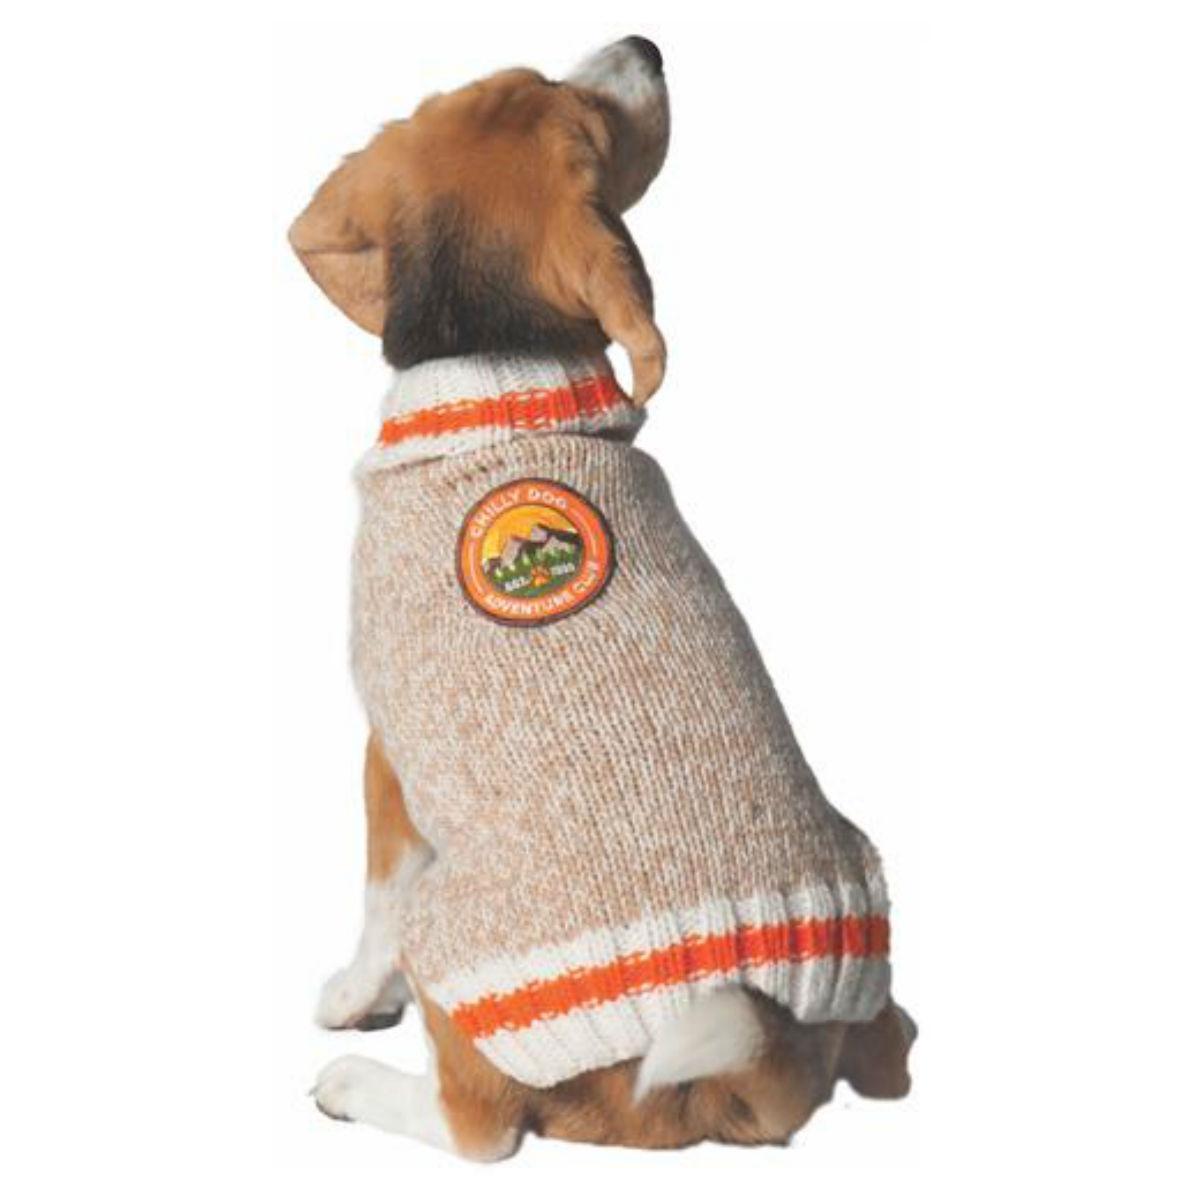 Handmade Adventure Club Wool Dog Sweater